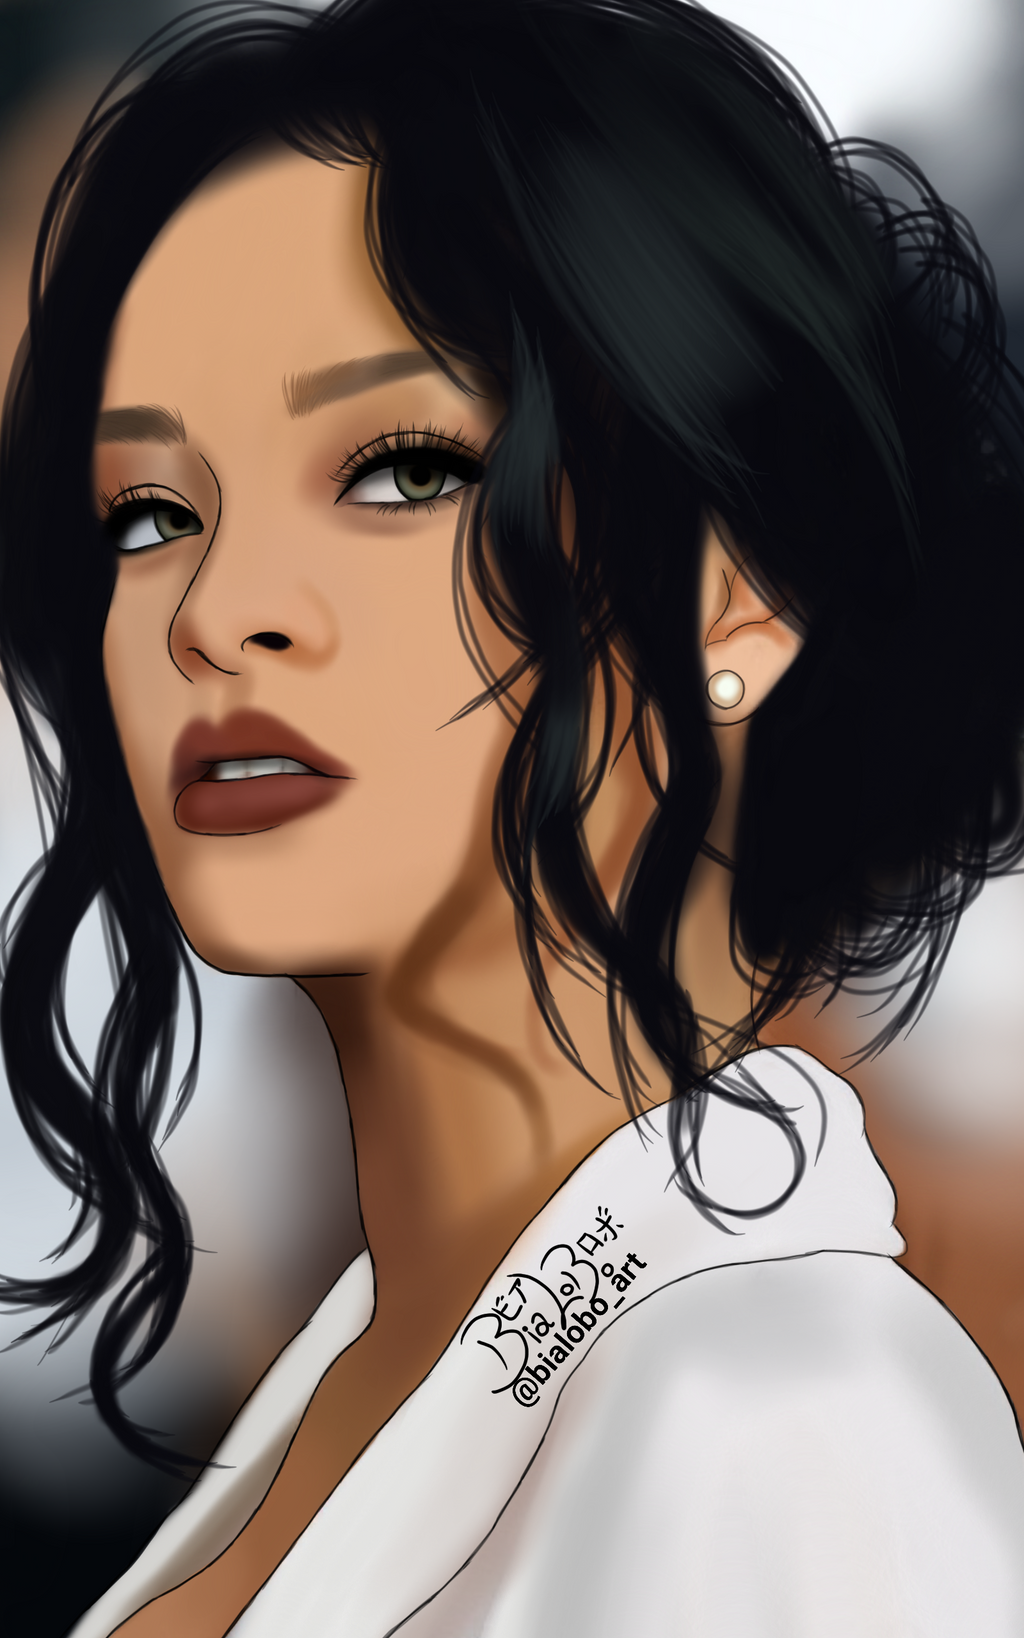 Rihanna Fanart byBiaLobo by BiaLobo on DeviantArt